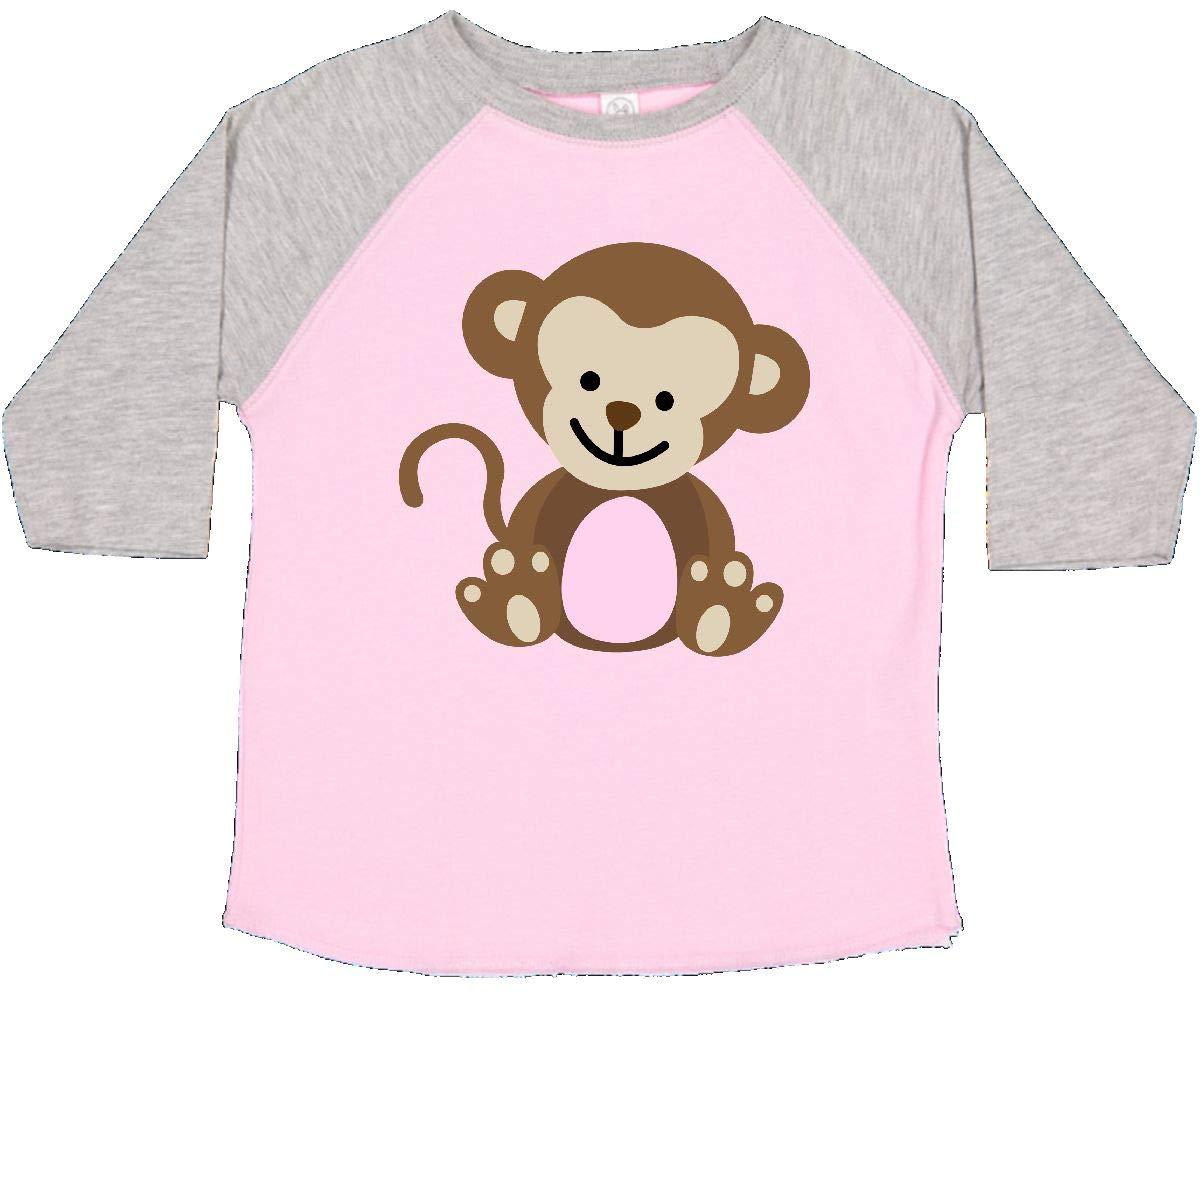 inktastic Monkey Toddler T-Shirt